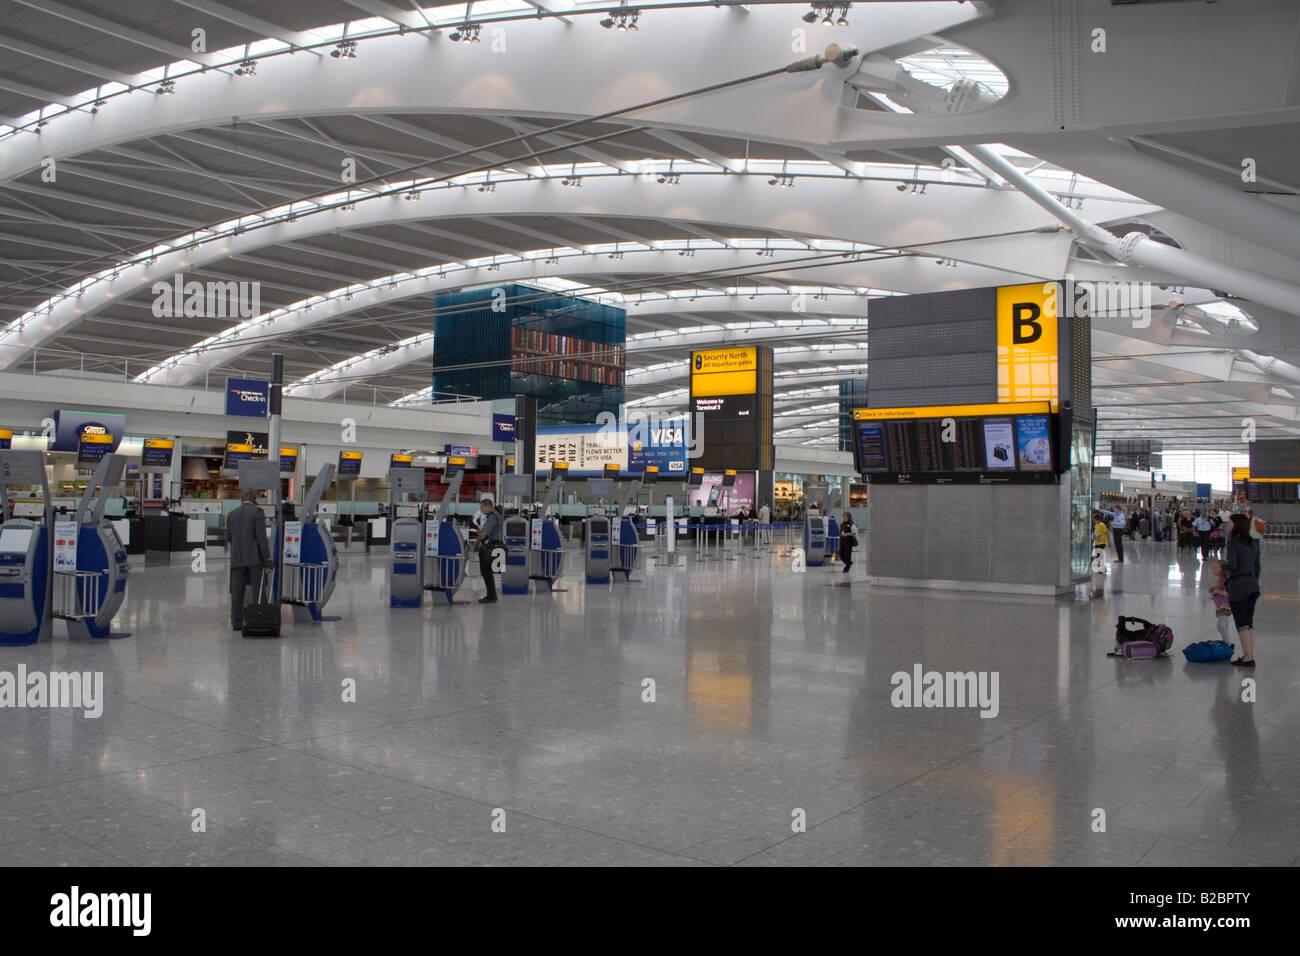 Terminal 5 departures, Heathrow Airport - Stock Image